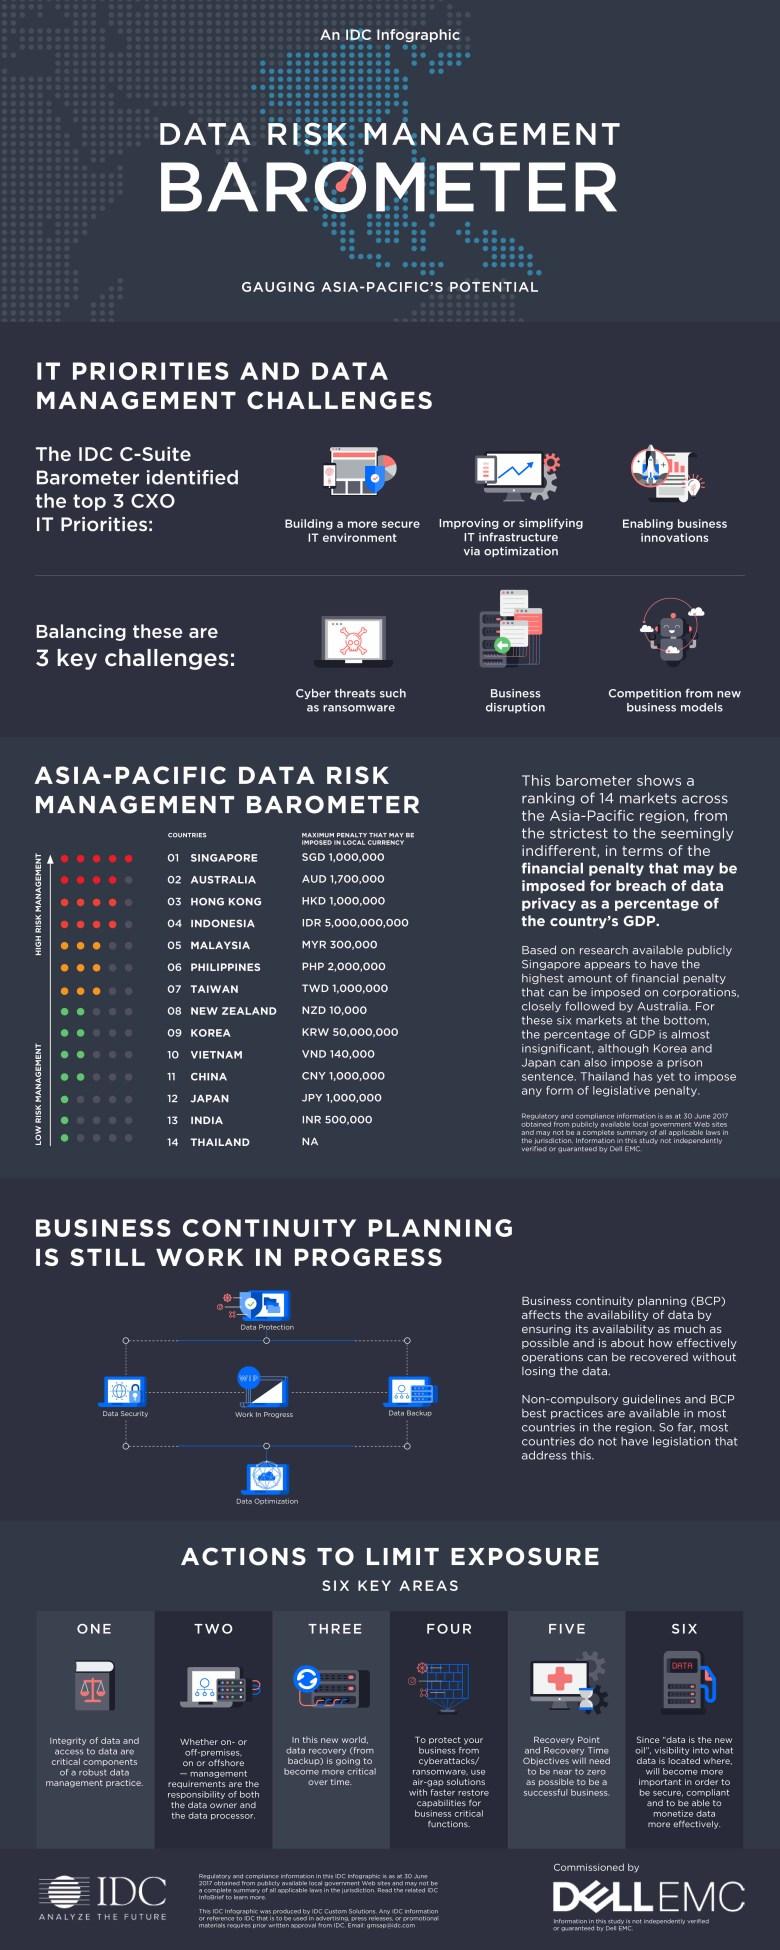 Data Risk Management Barometer Infographic